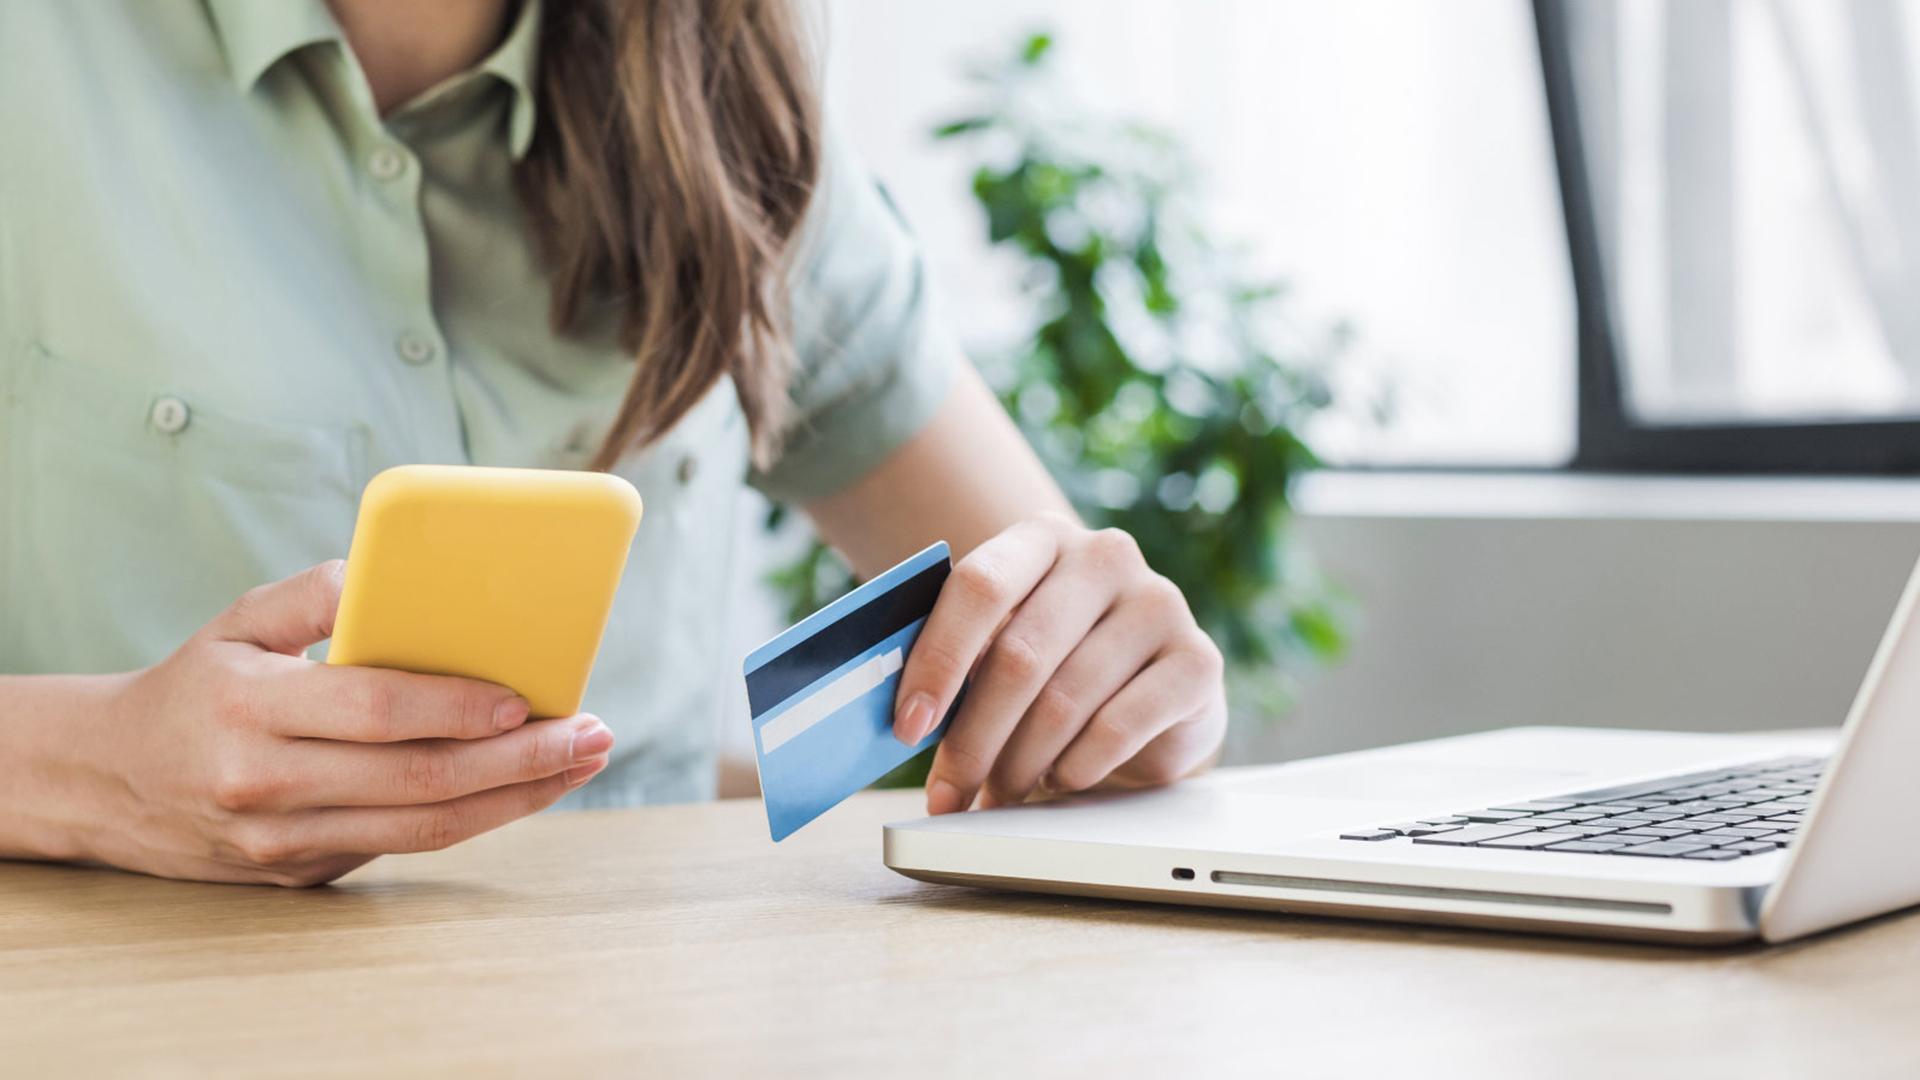 Consumer finance